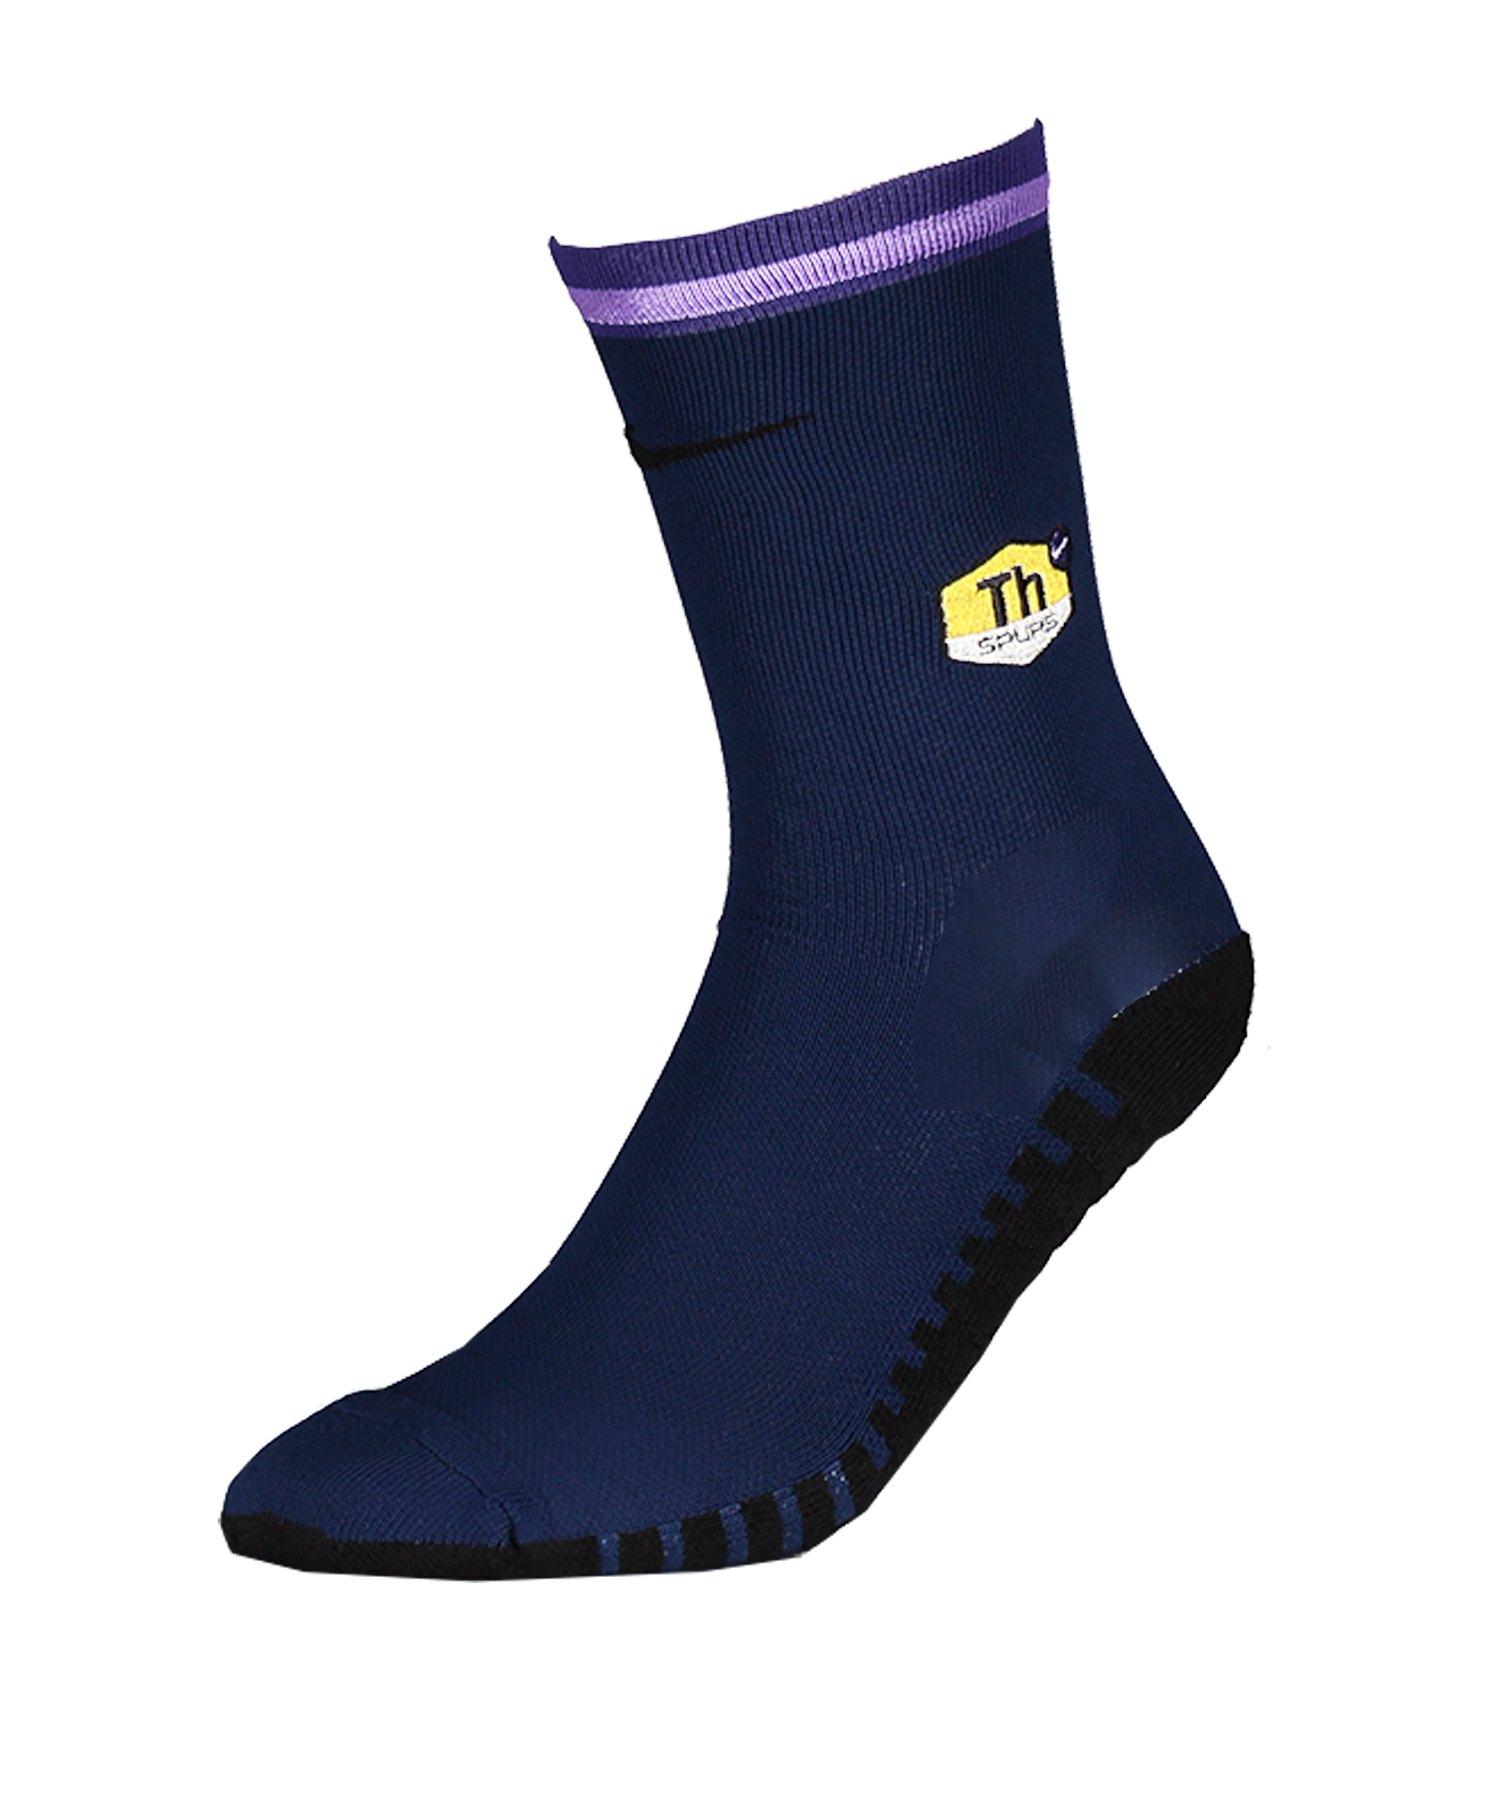 Nike Tottenham Hotspur Squad Crew Socken Blau F429 - blau